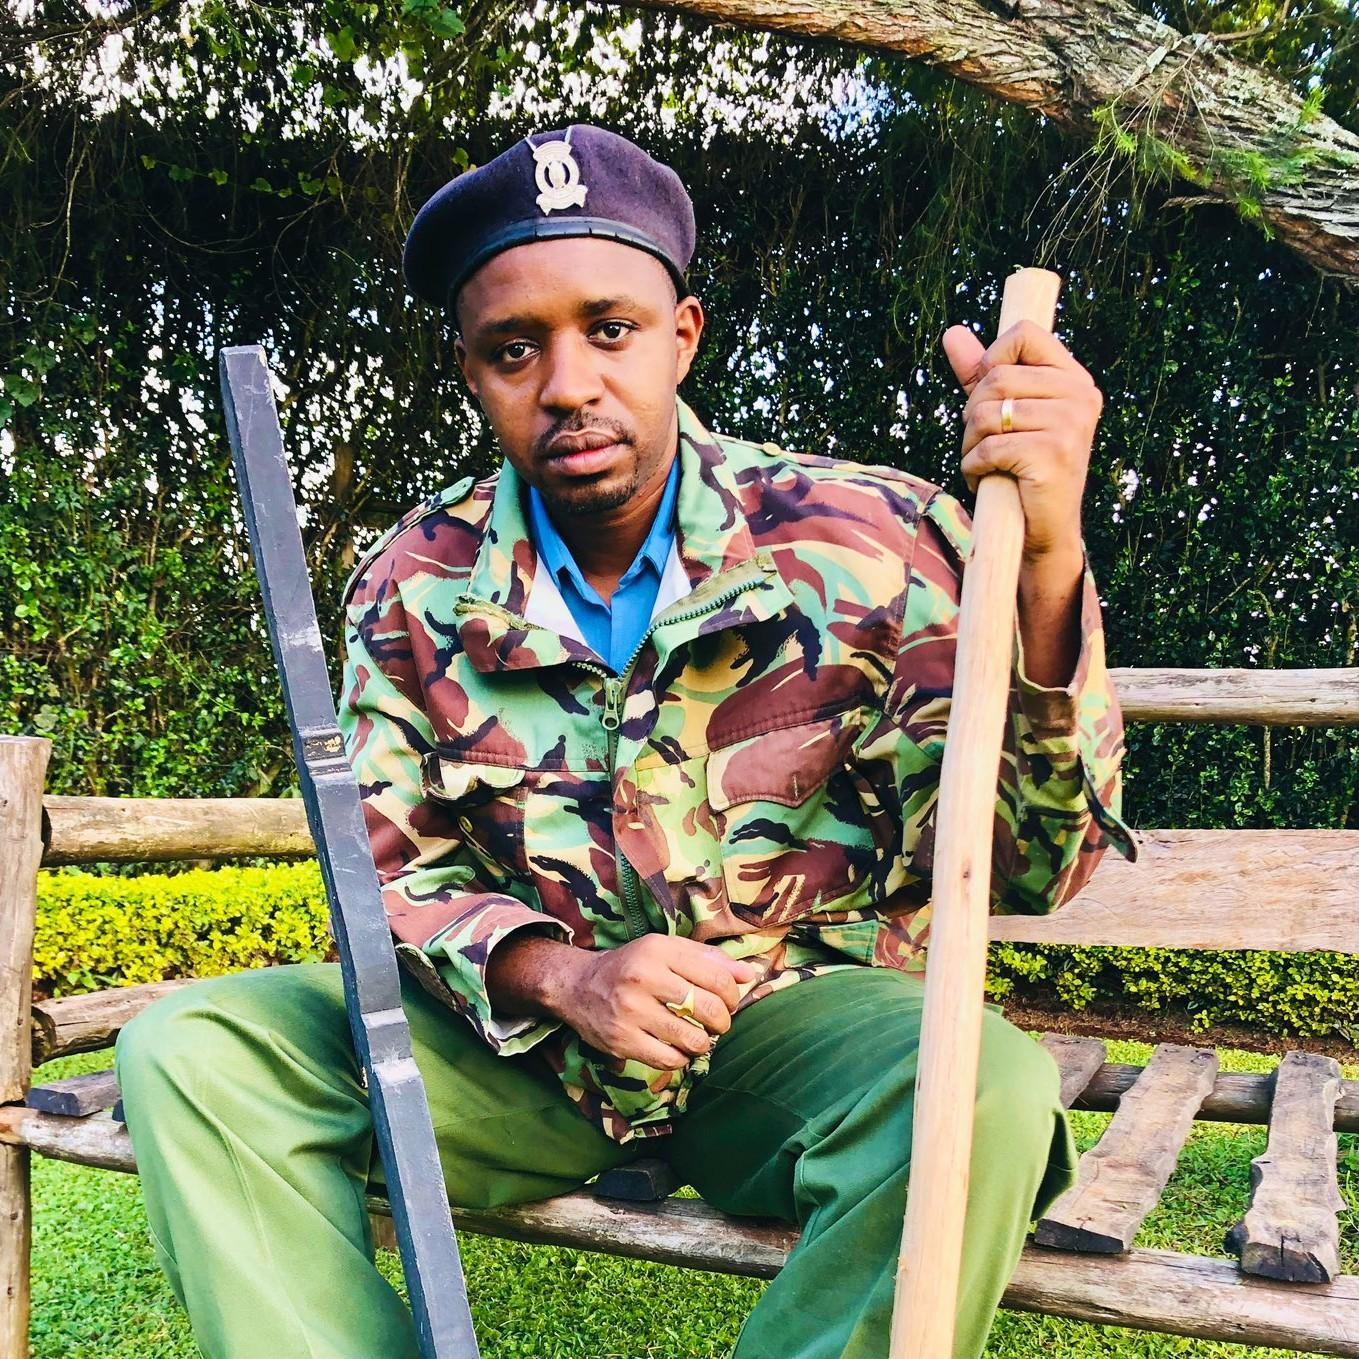 Boniface Mwangi Announces His Retirement From Politics And Activism